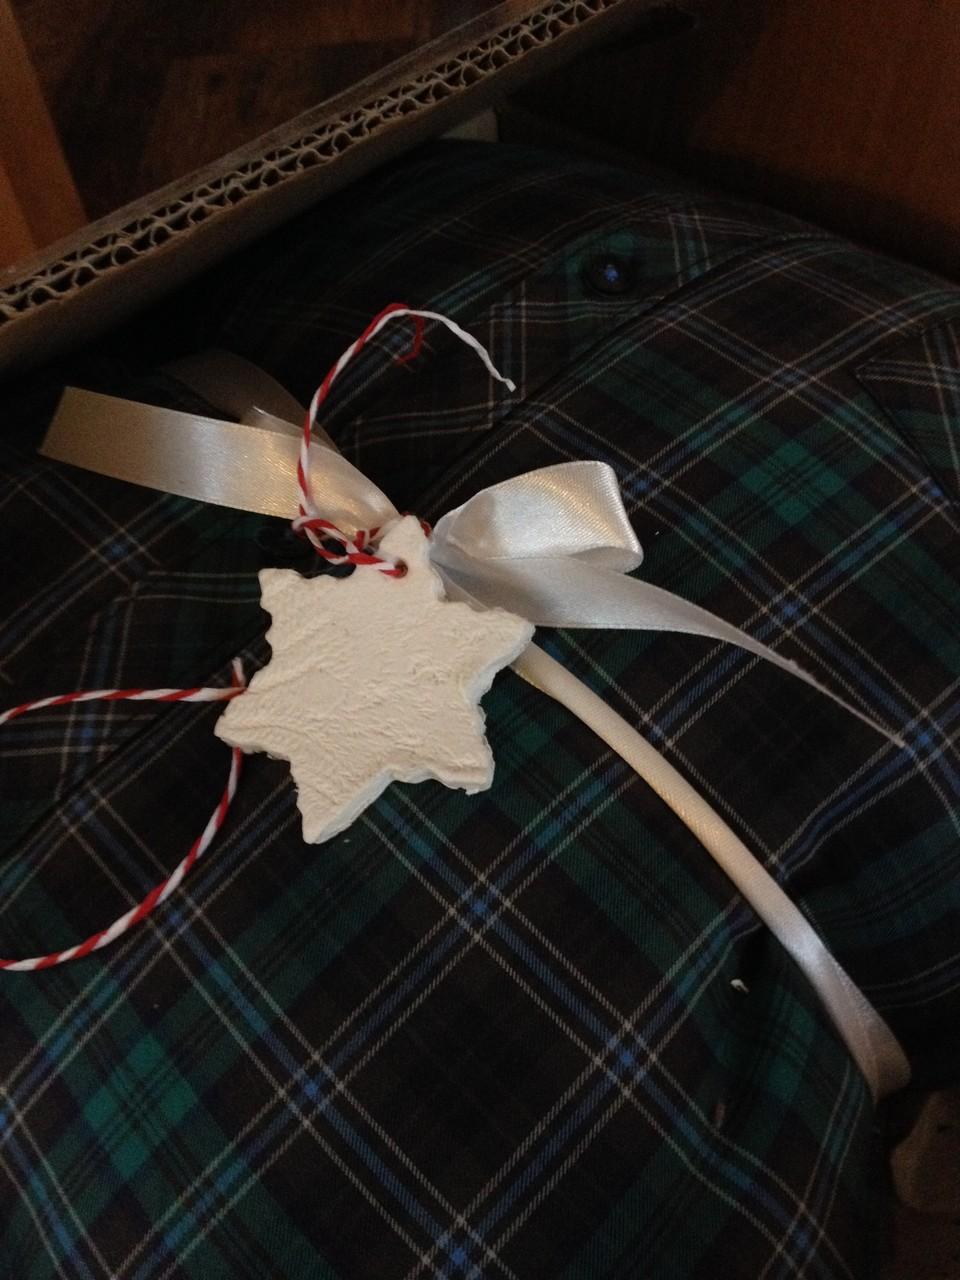 Mit den fertigen Figuren könnt ihr dann eure Geschenke verzieren :)